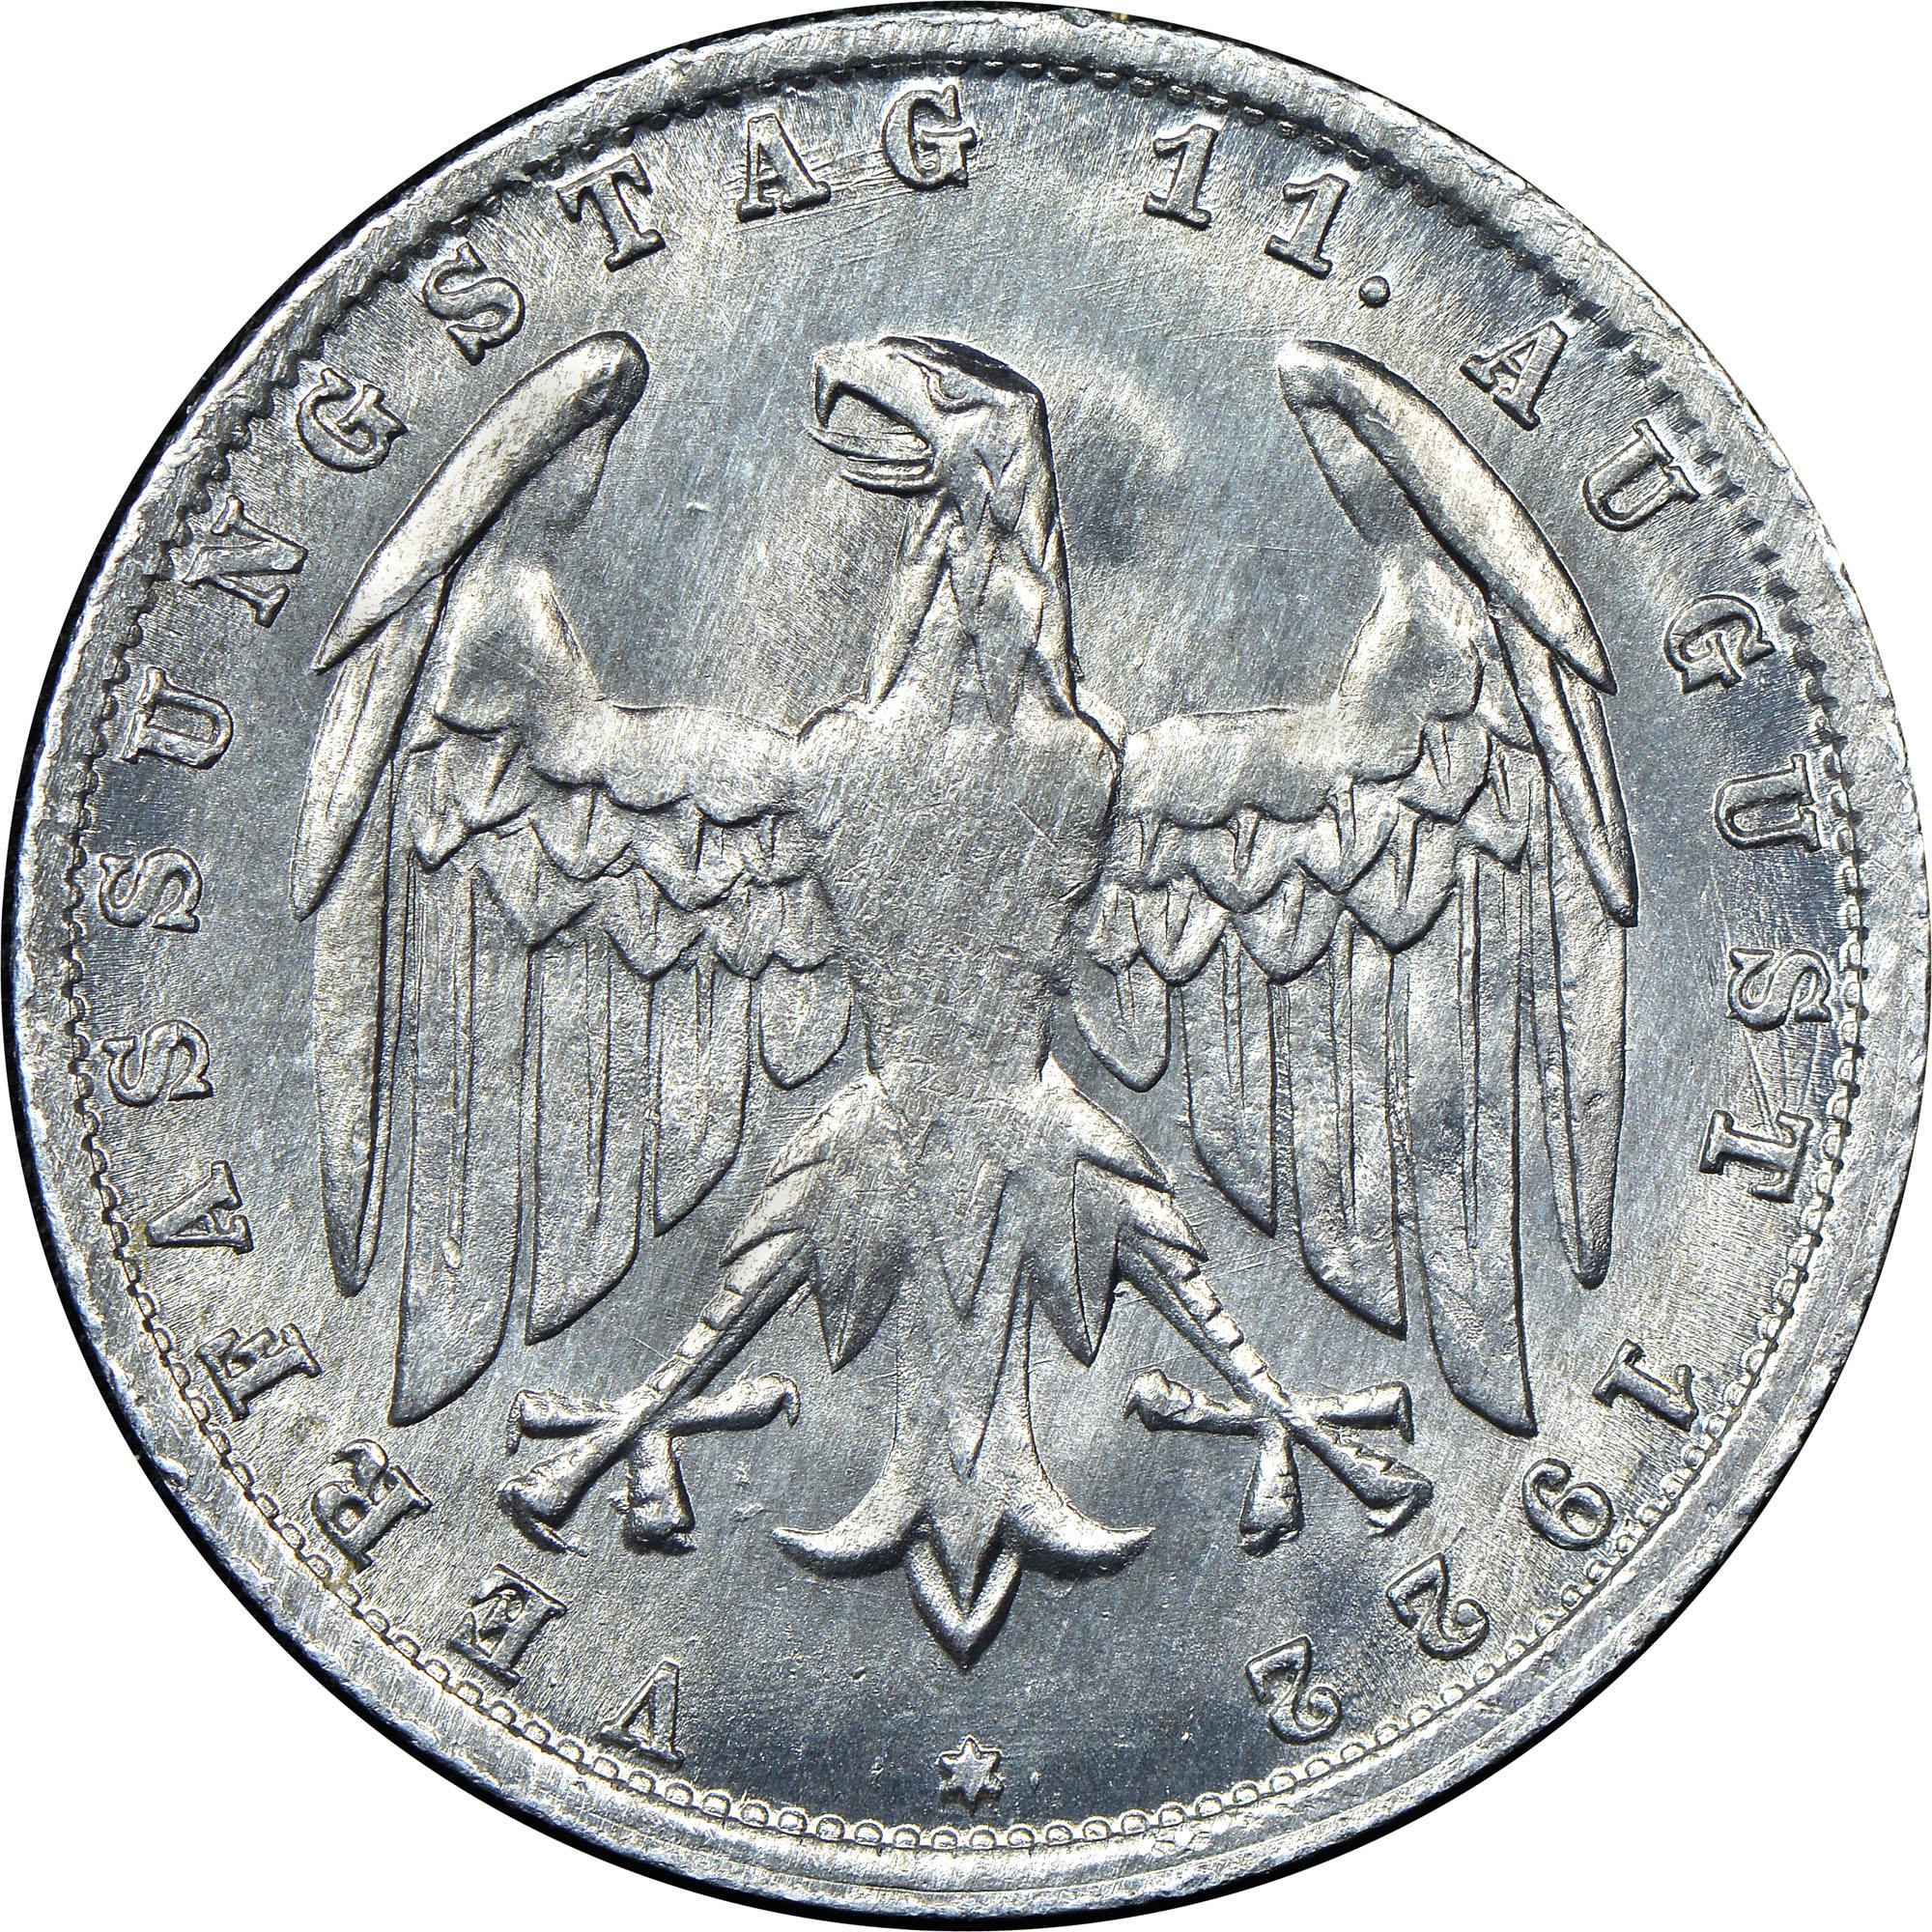 Germany - Weimar Republic 3 Mark reverse